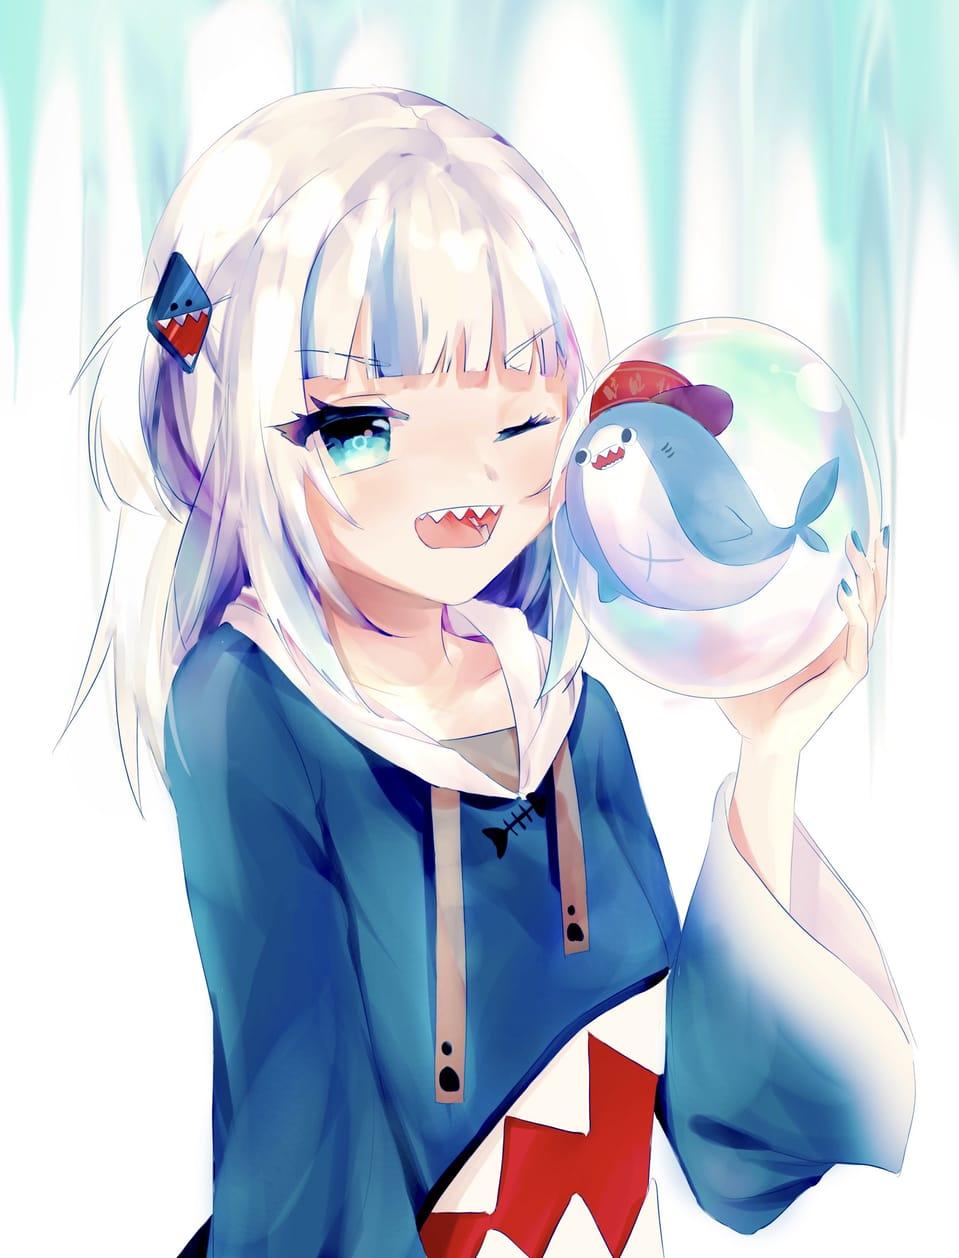 GawrGura Illust of Yuurei鬼 blue virtual_YouTuber fanfic water portrait woman girl Artwork 同人 art